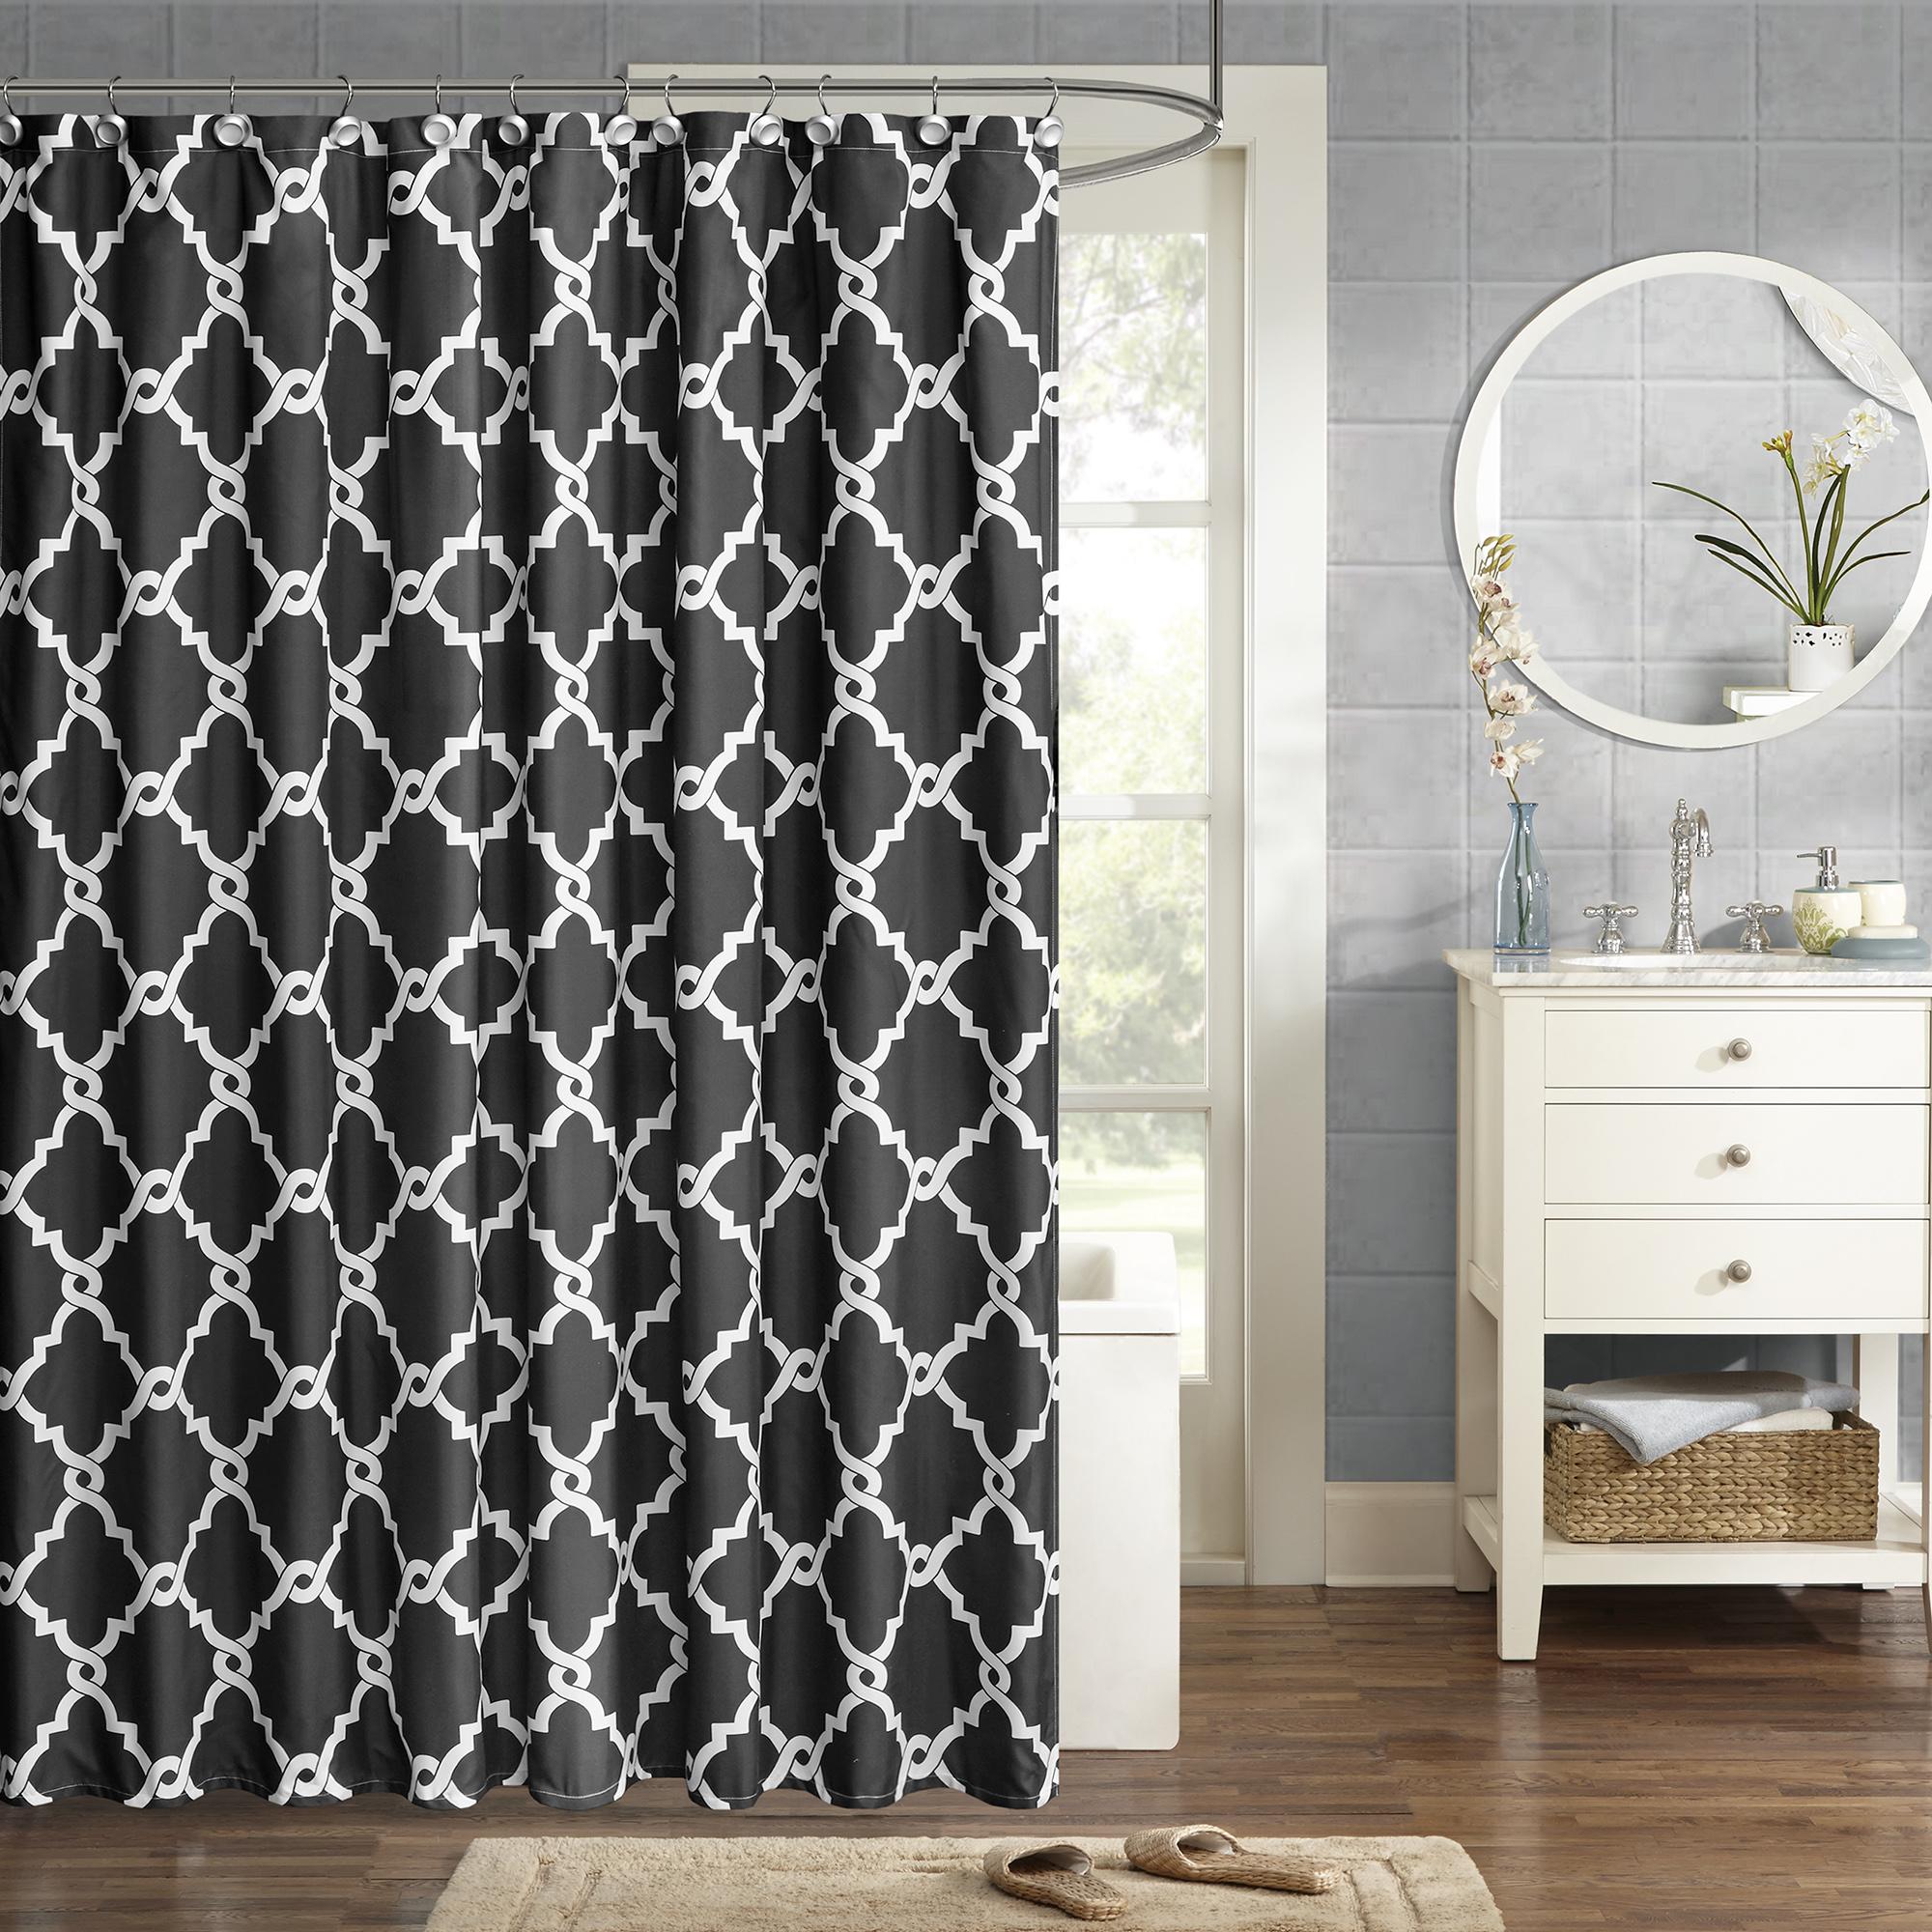 Home Essence Becker Ultra Soft Printed Shower Curtain